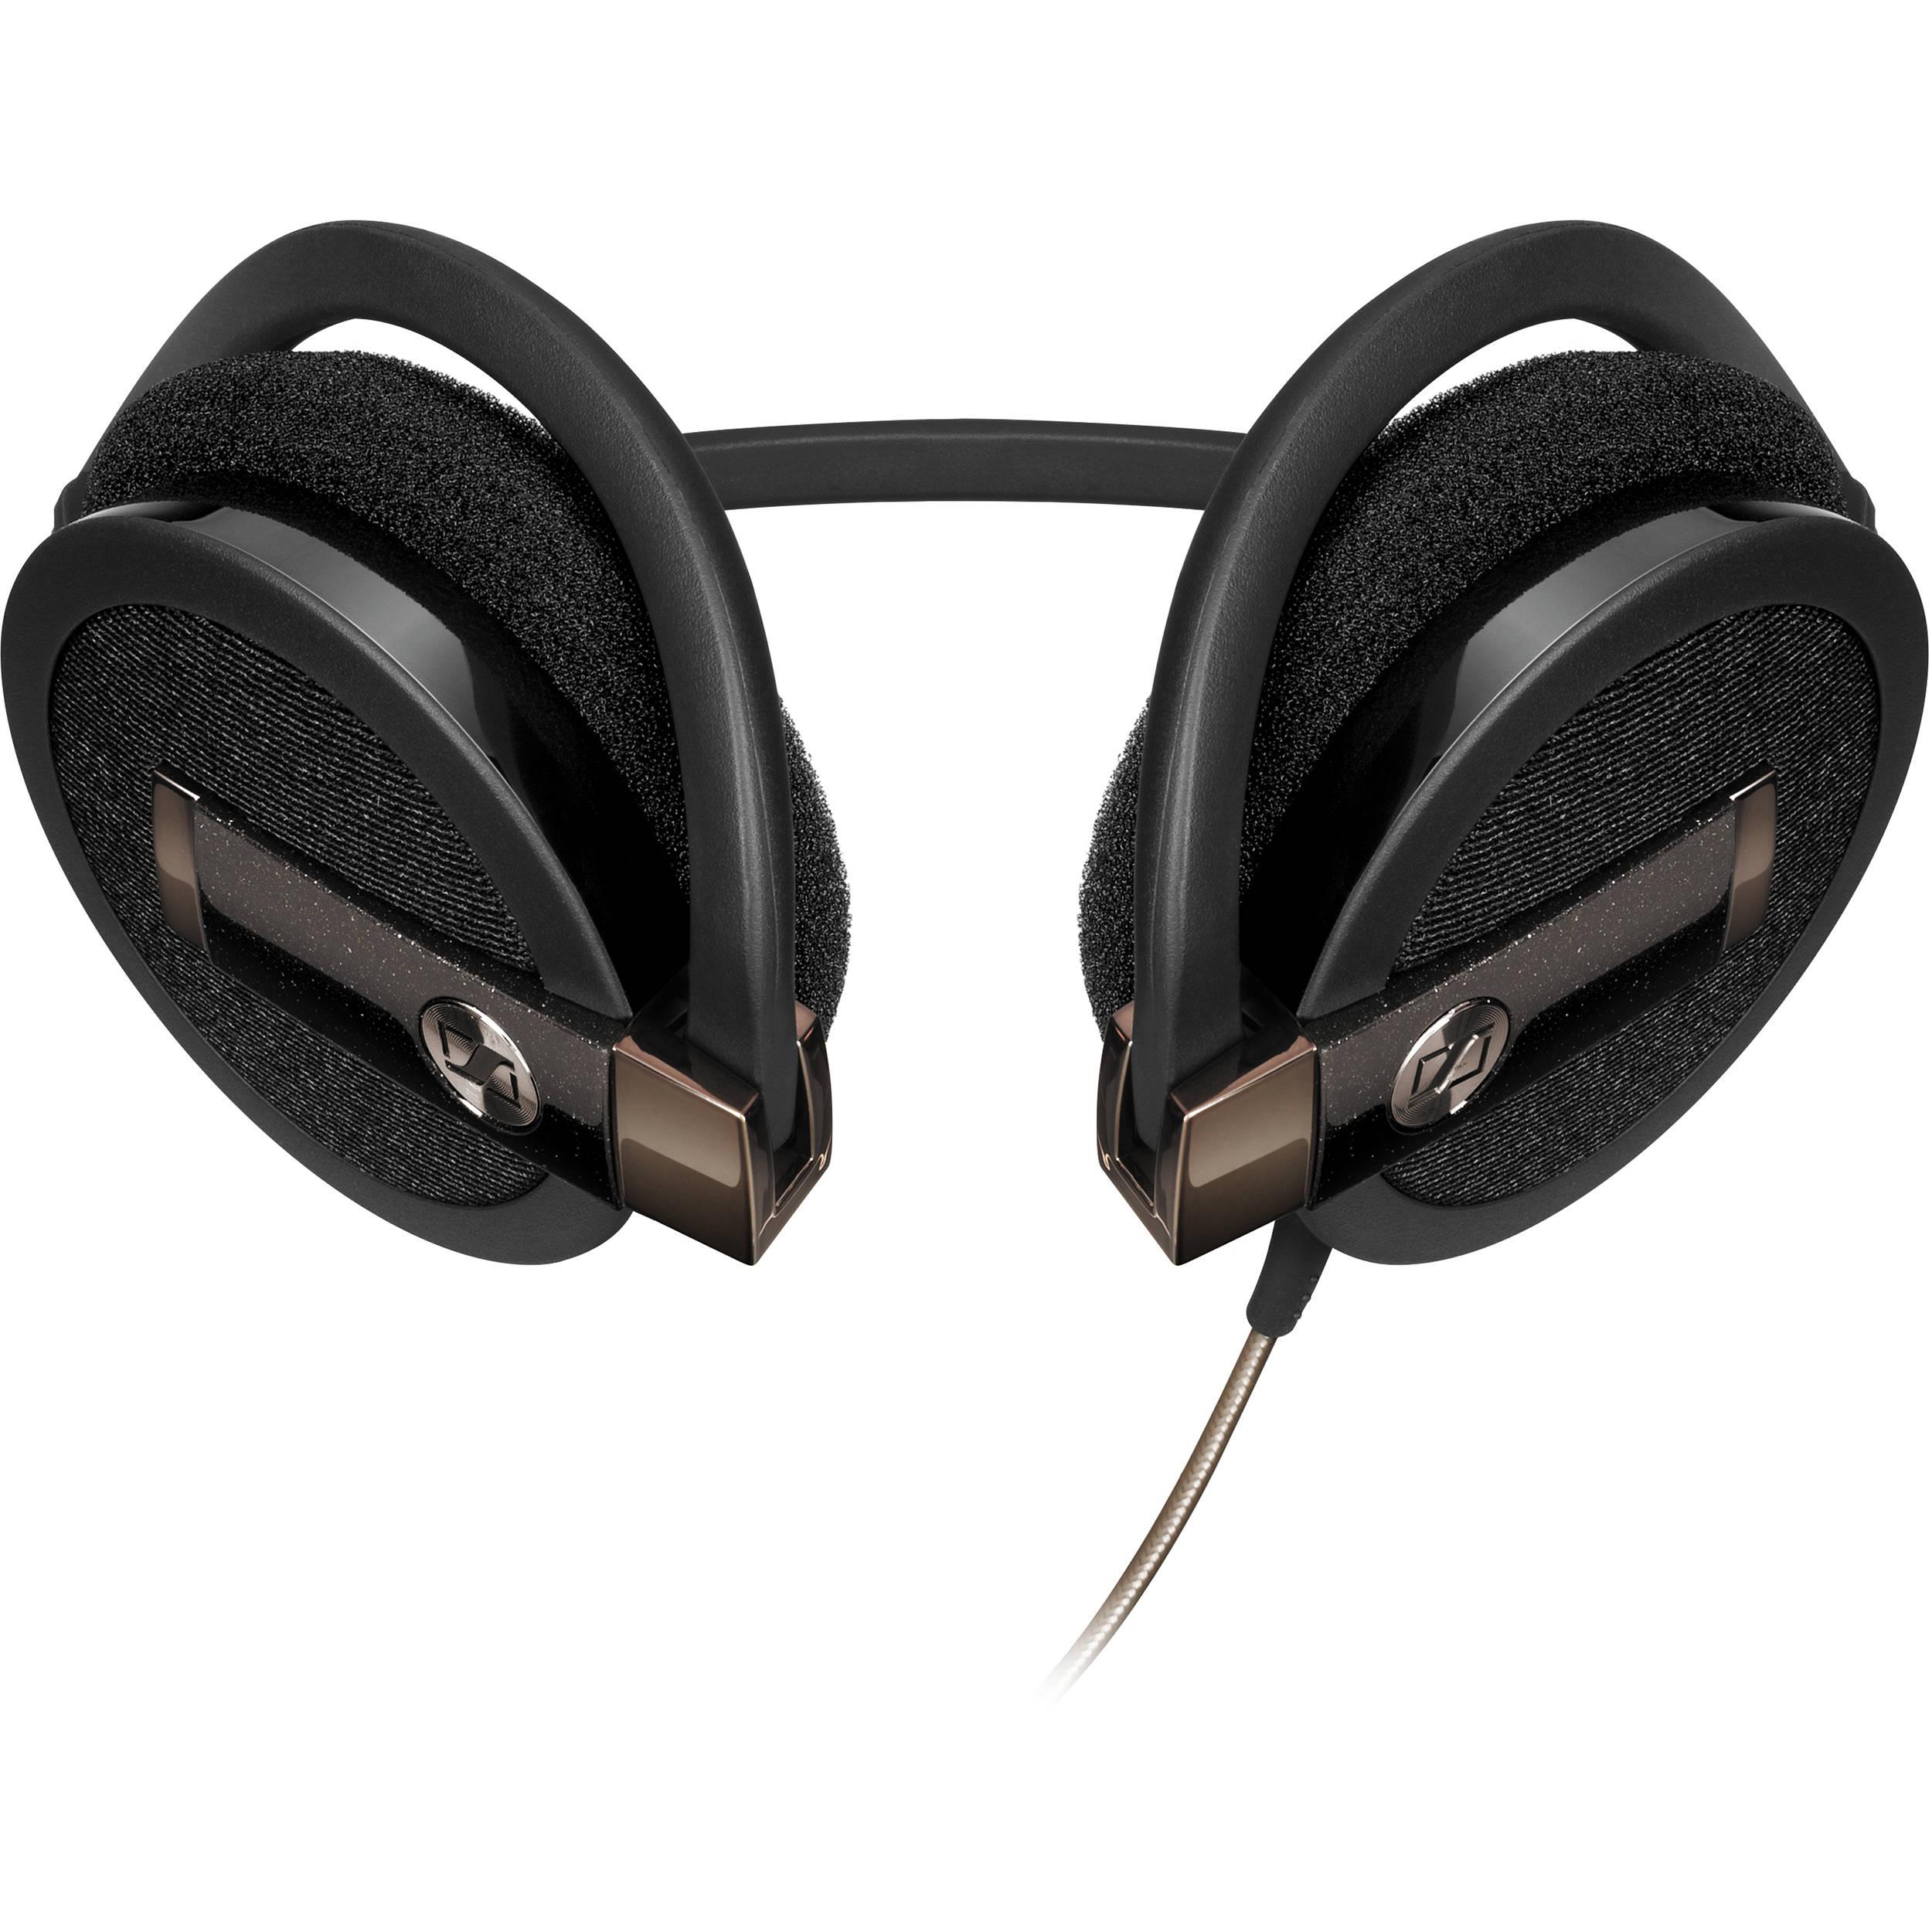 sennheiser pmx 95 neckband headphones 505491 b h photo video. Black Bedroom Furniture Sets. Home Design Ideas